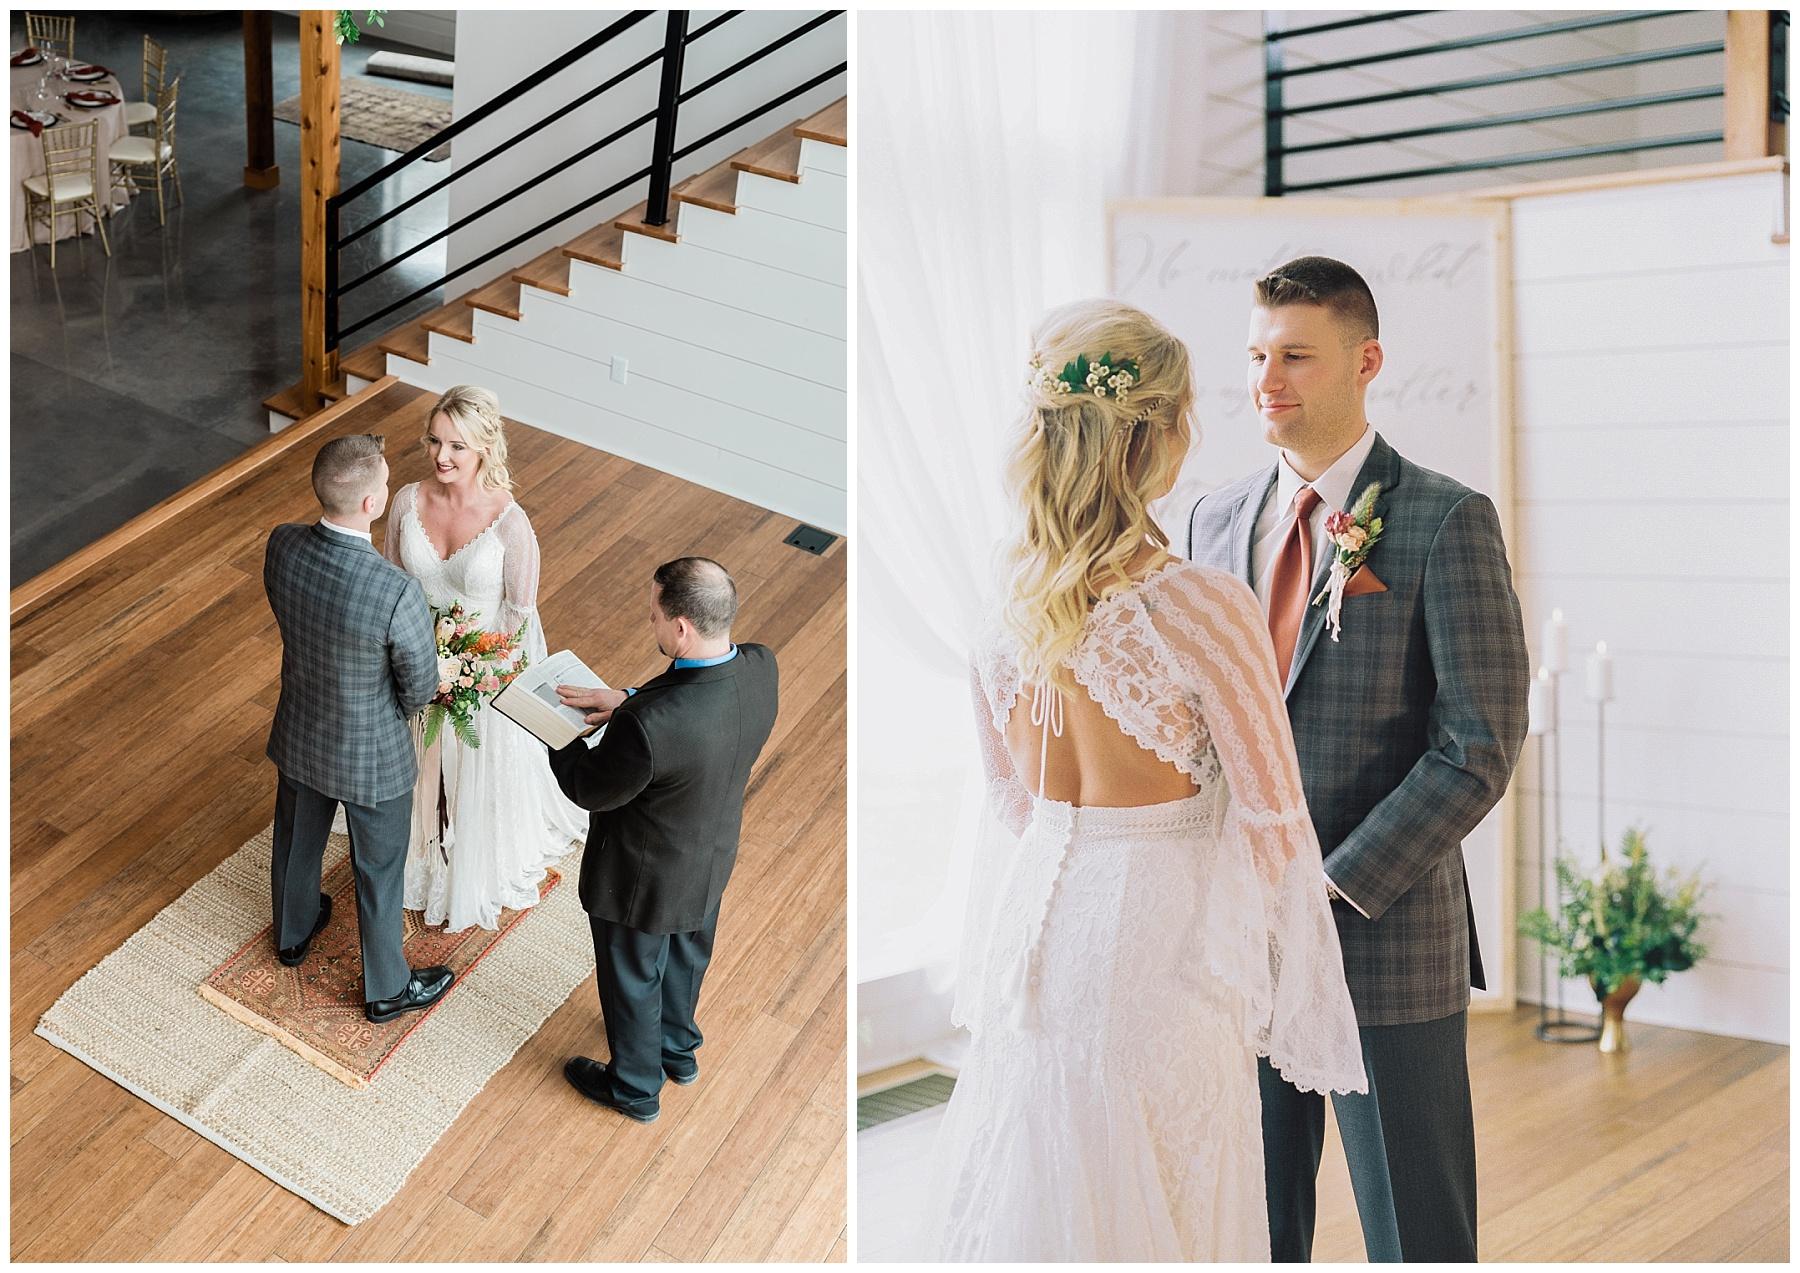 Eclectic Scandinavian Winter Wedding in All White Venue Emerson Fields by Kelsi Kliethermes Photography Best Missouri and Maui Wedding Photographer_0065.jpg